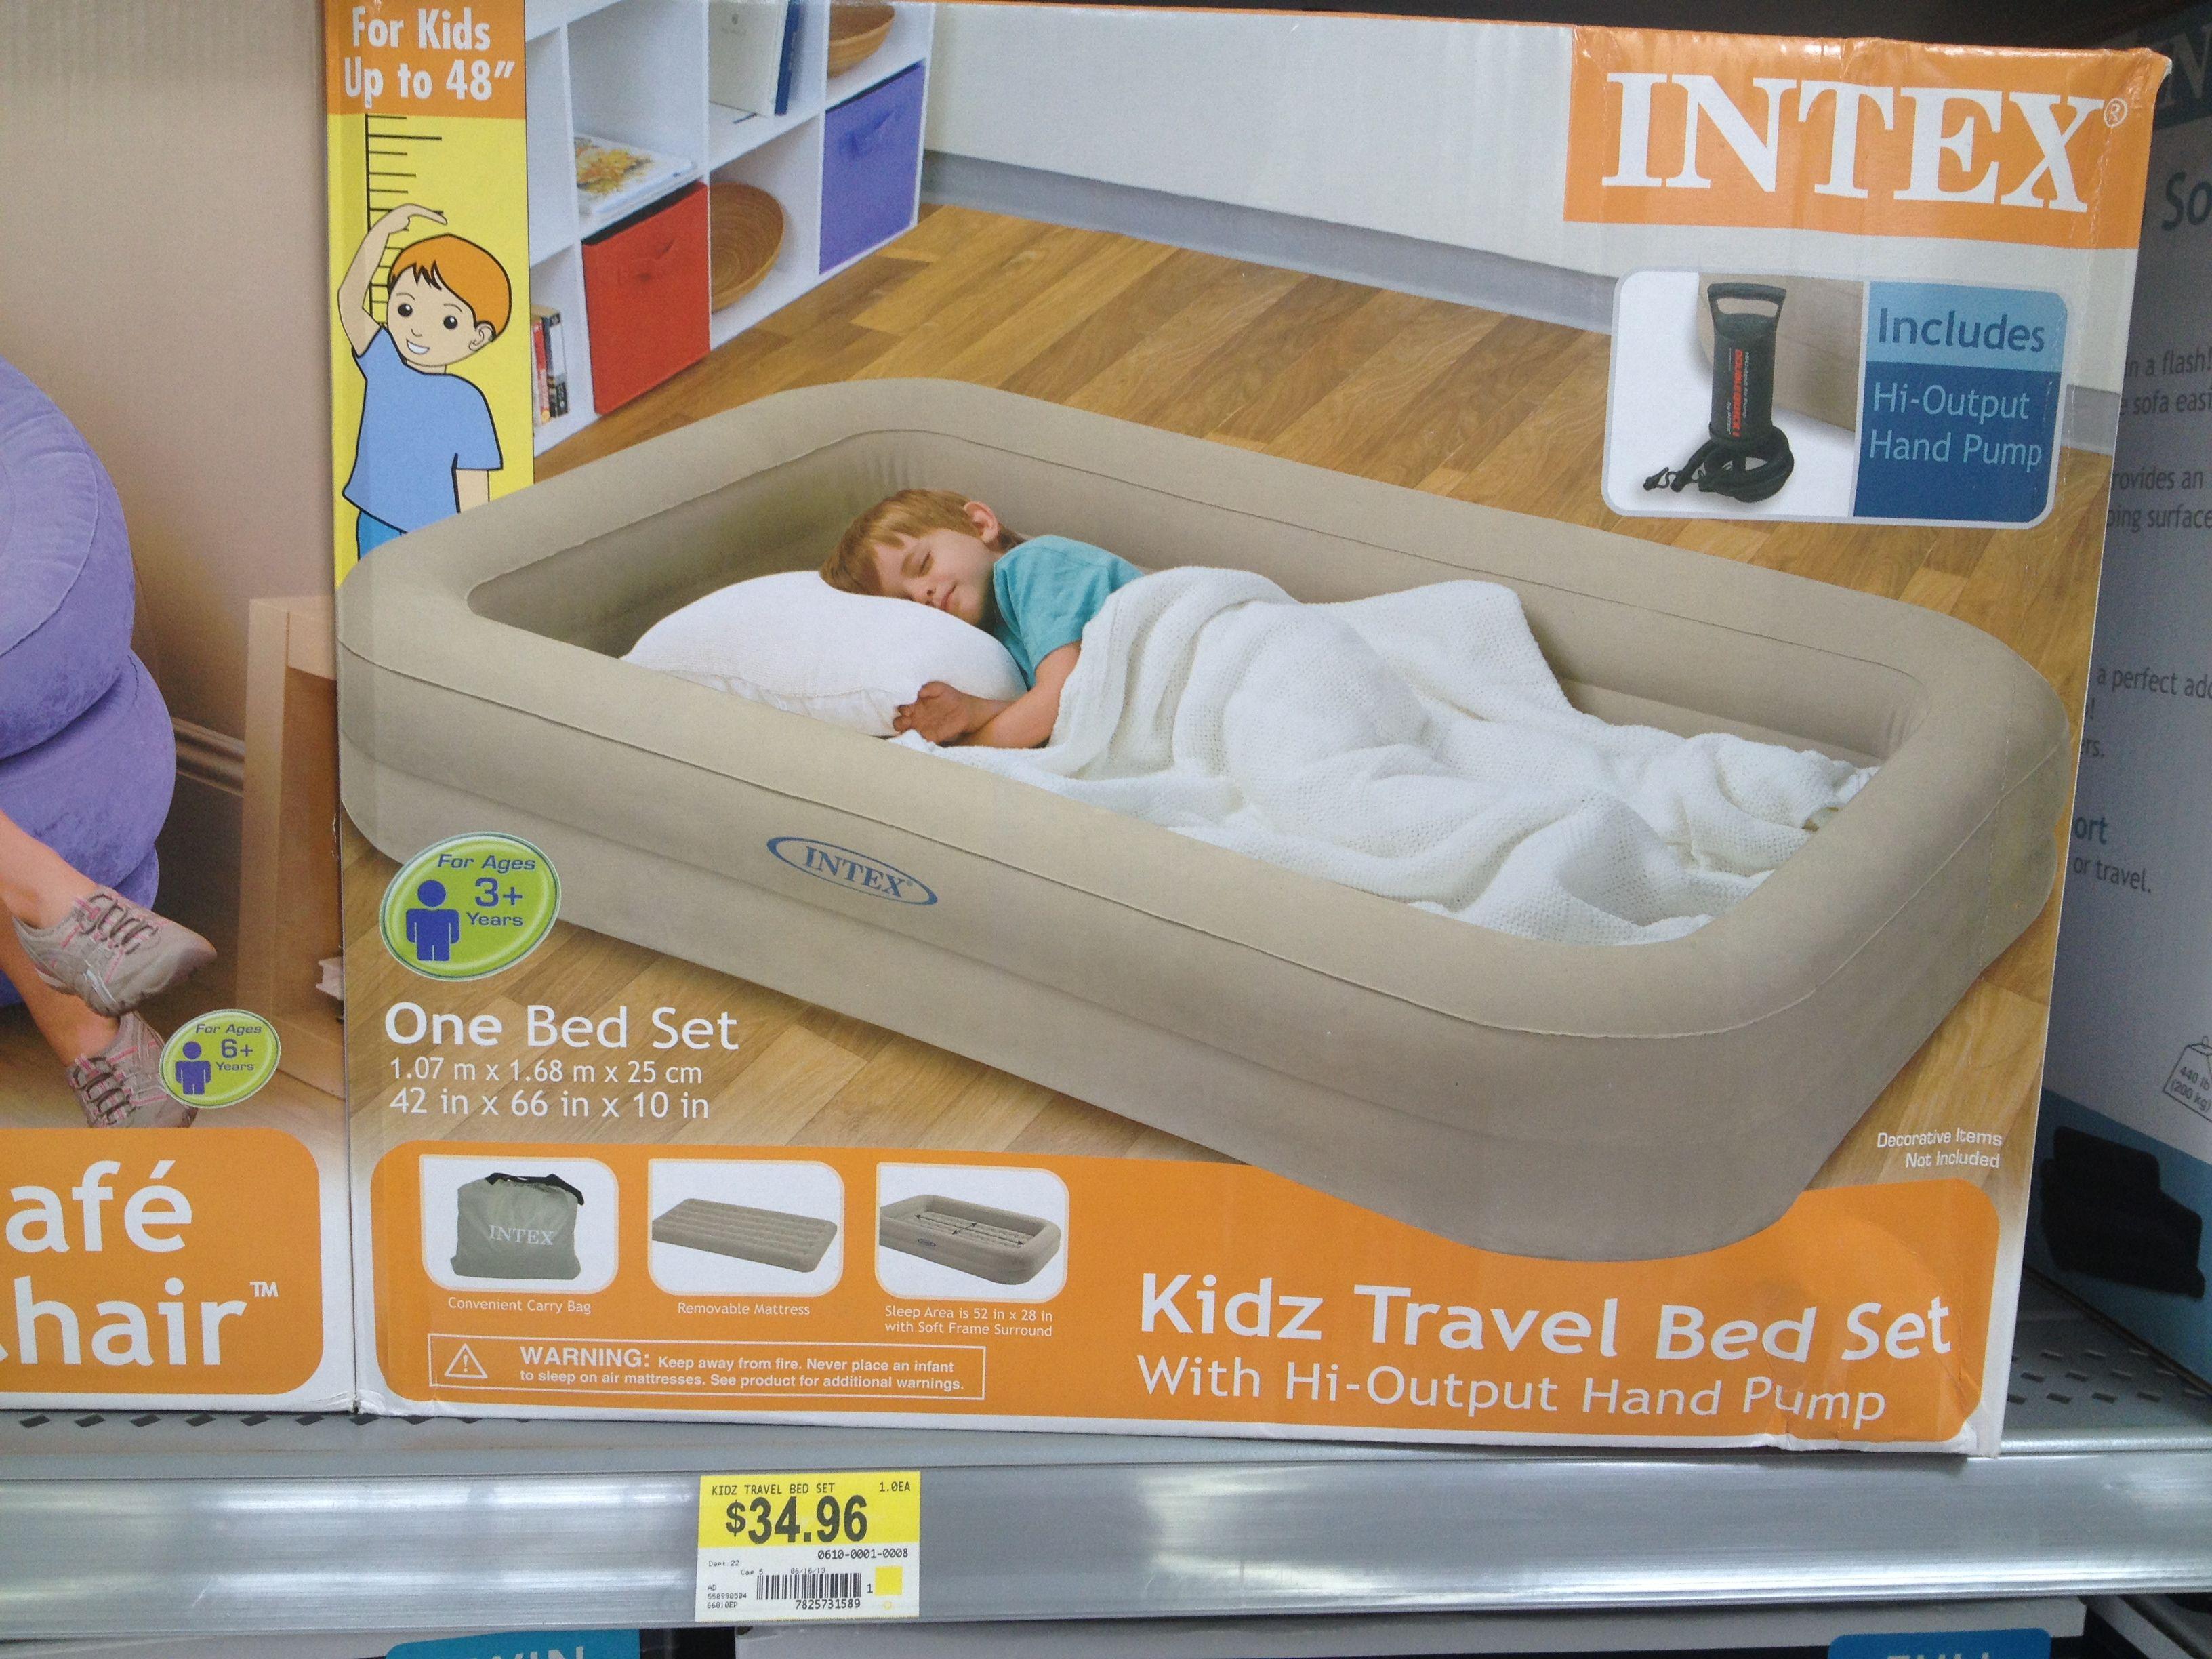 Intex Blow Up Air Mattress From Walmart This Has Great